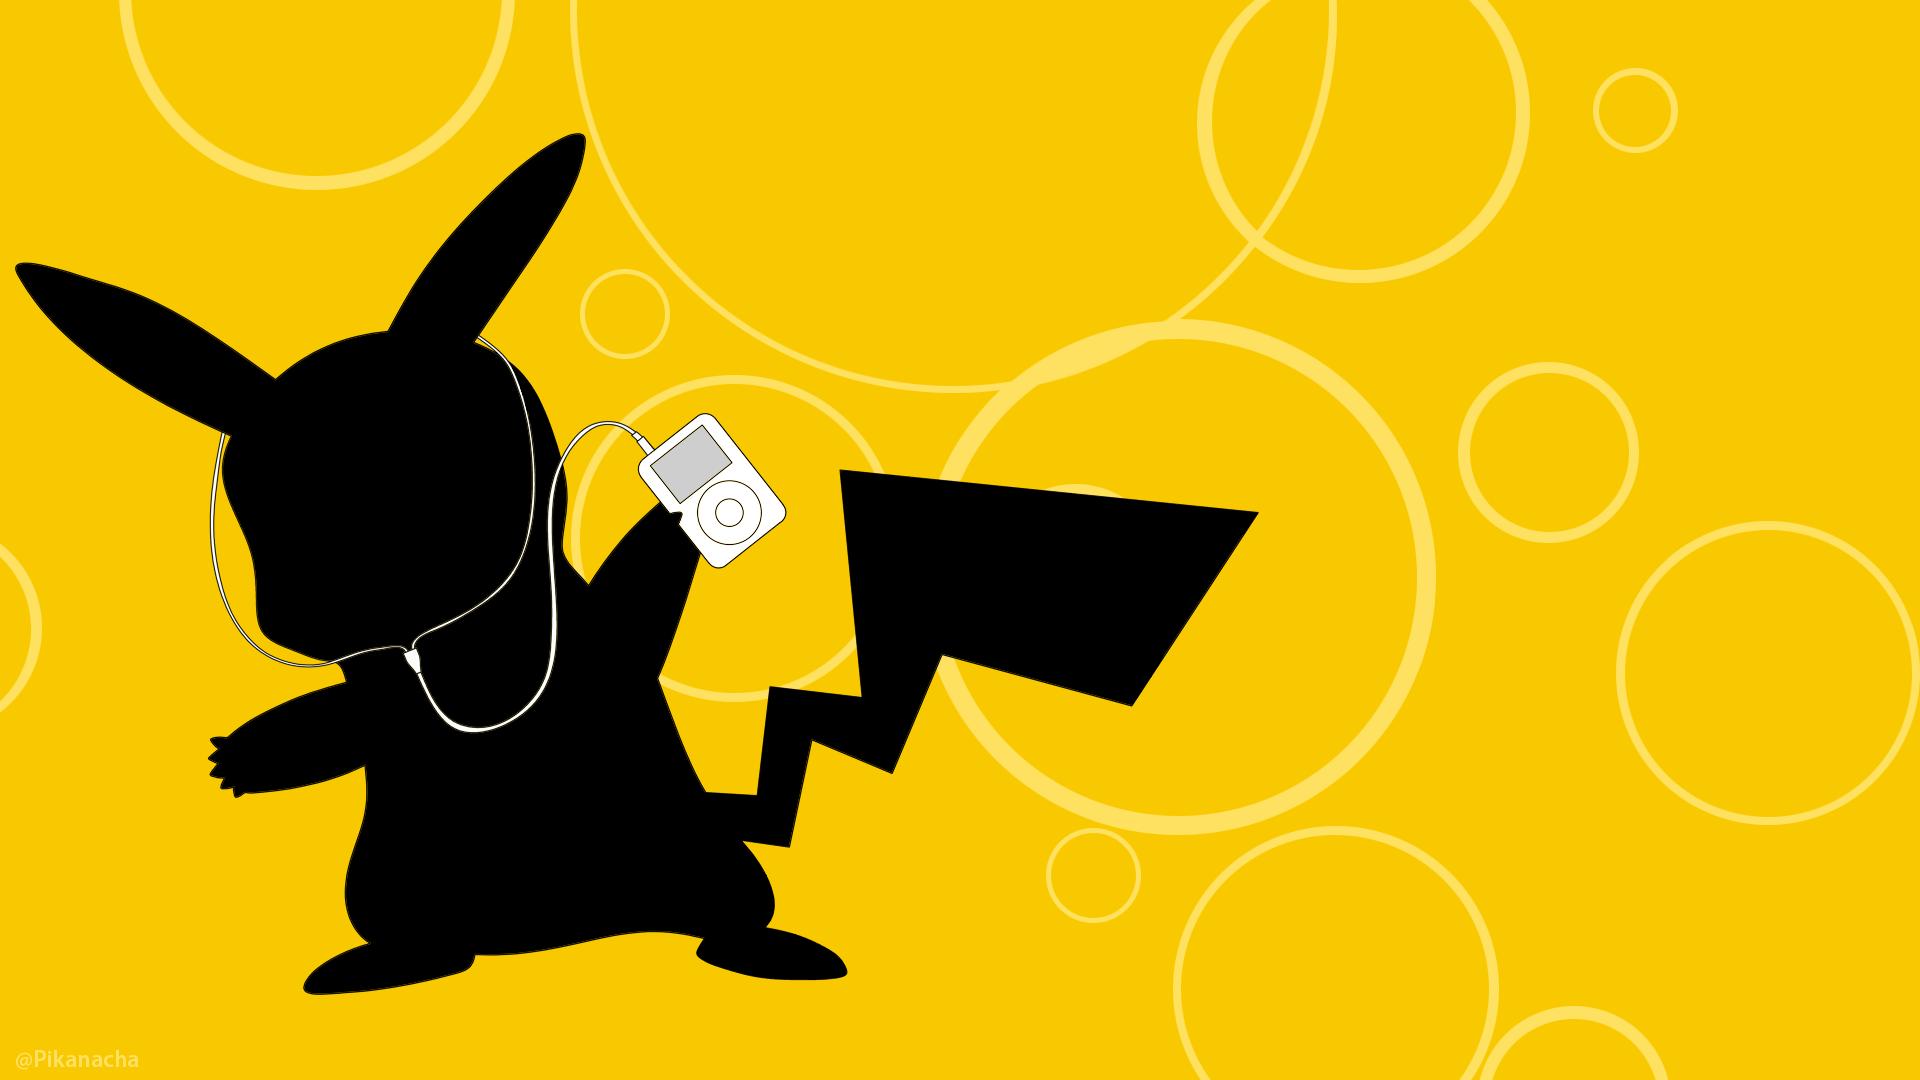 Pikachu+iPod Wallpaper By Pikanacha On DeviantArt